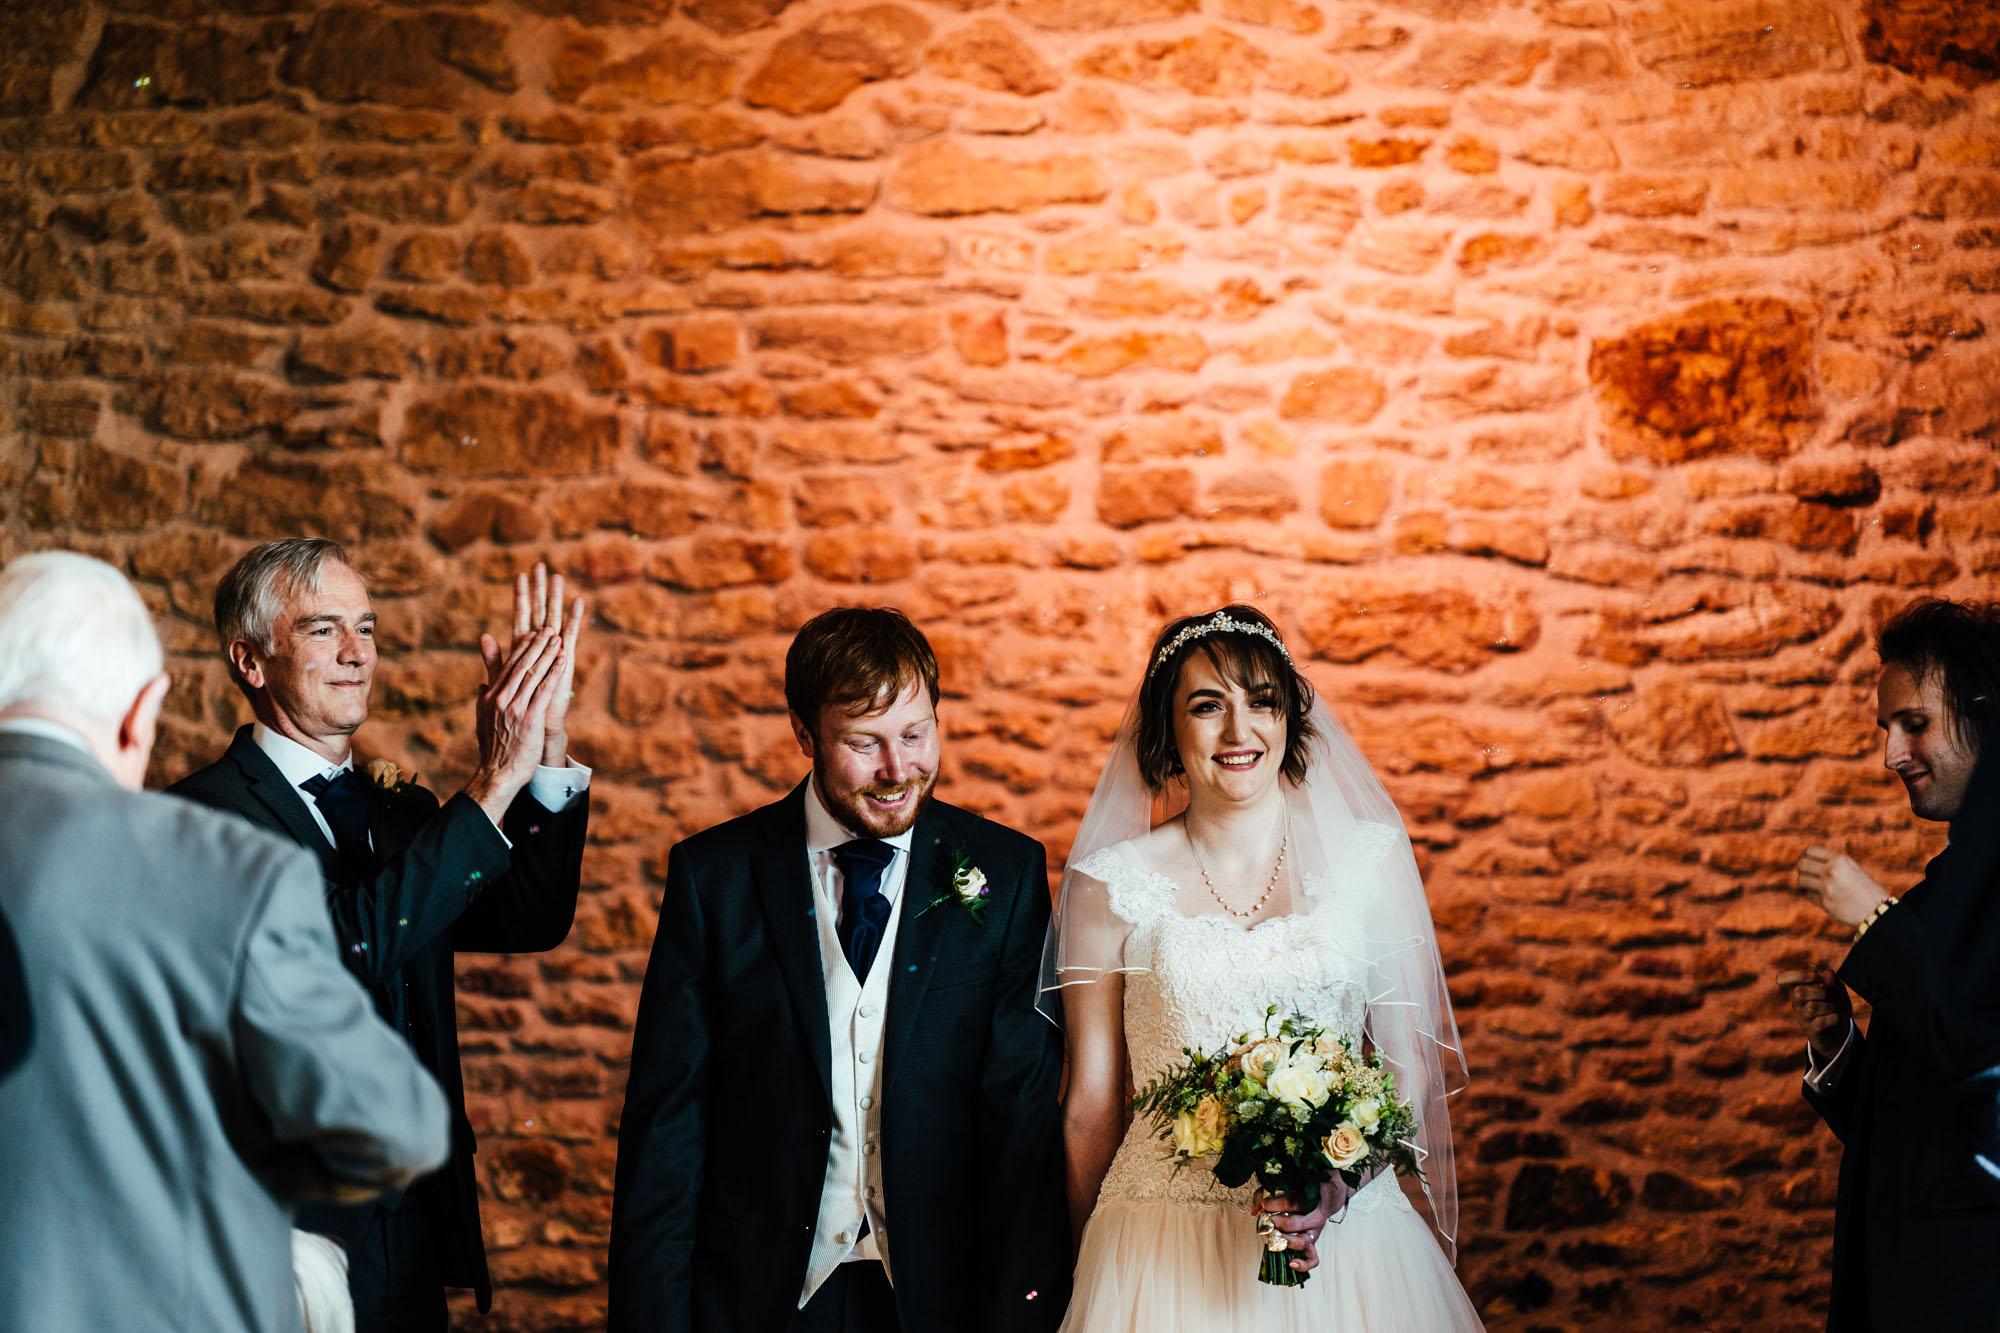 wedding-at-dodford-manor-42